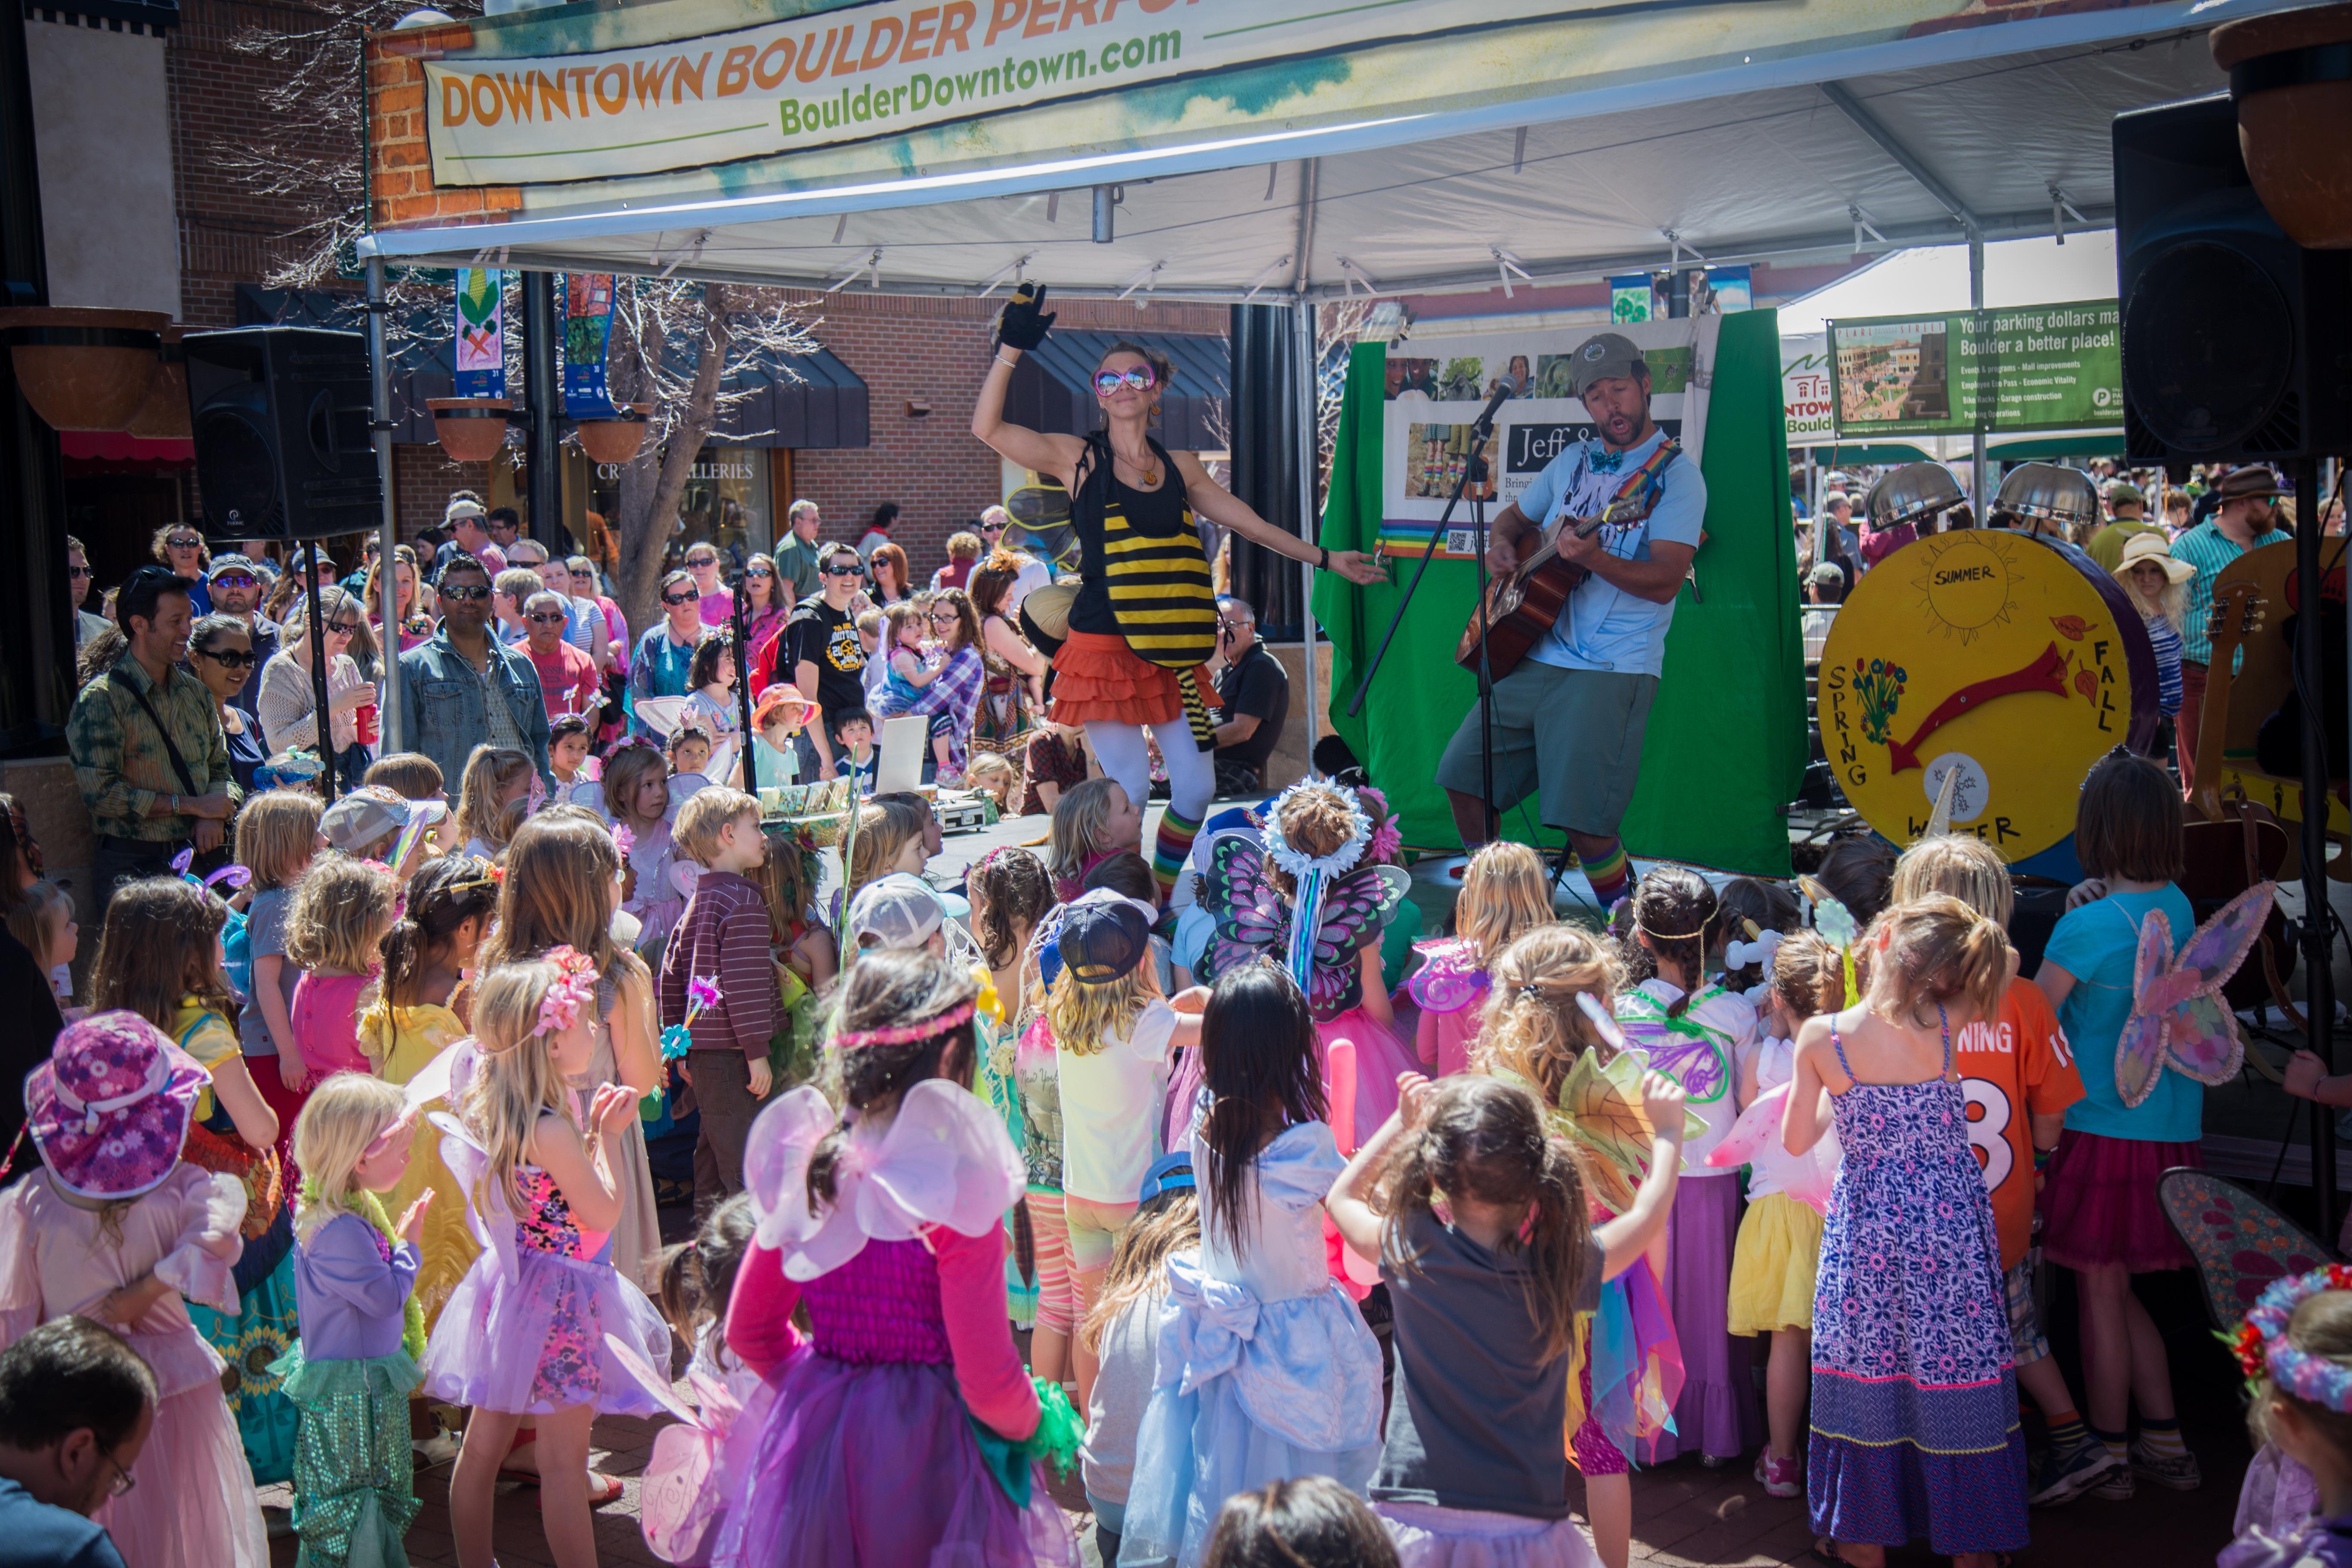 Tulip Fairy & Elf Festival Downtown Boulder